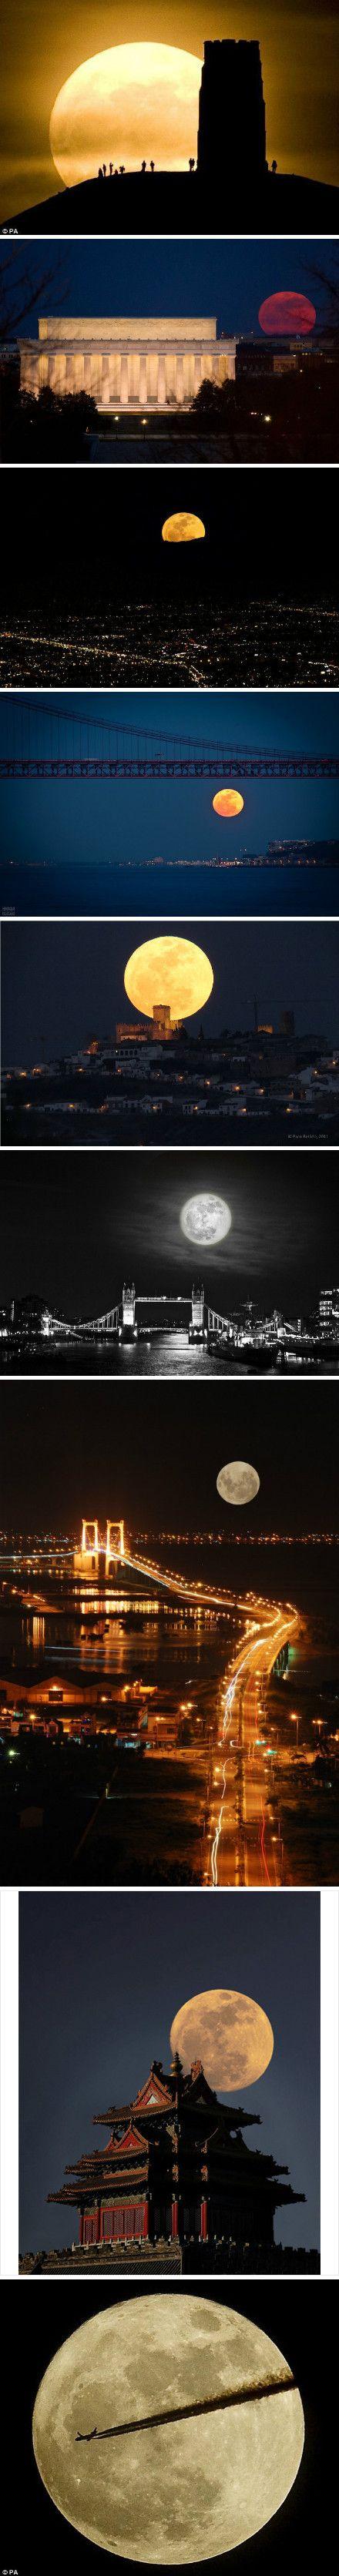 Supermoon around the World - May 5, 2012